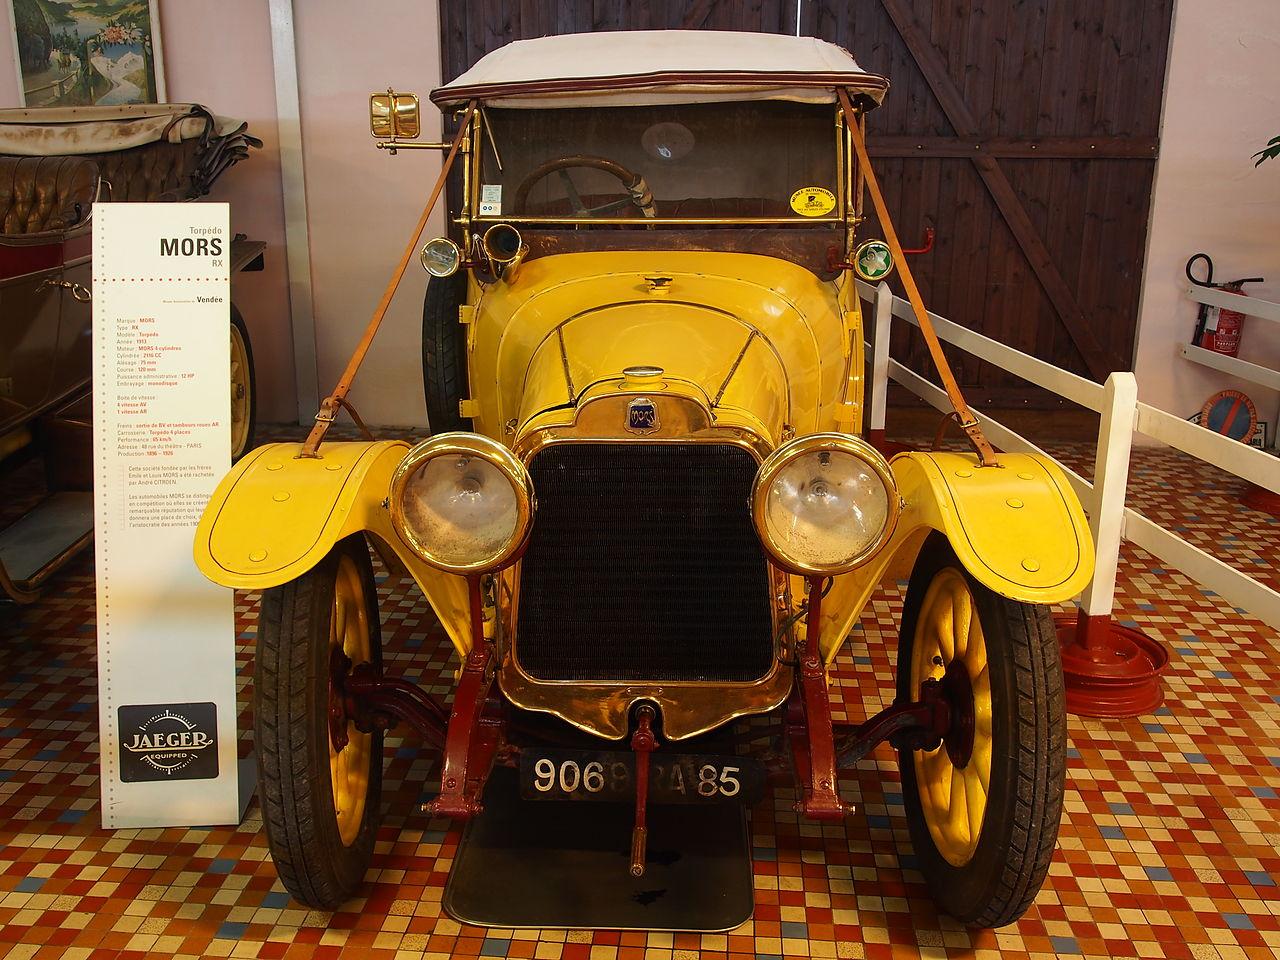 1913 mors rx 12cv 4 cyl at the mus e automobile de vend e pic 2 jpg. Black Bedroom Furniture Sets. Home Design Ideas